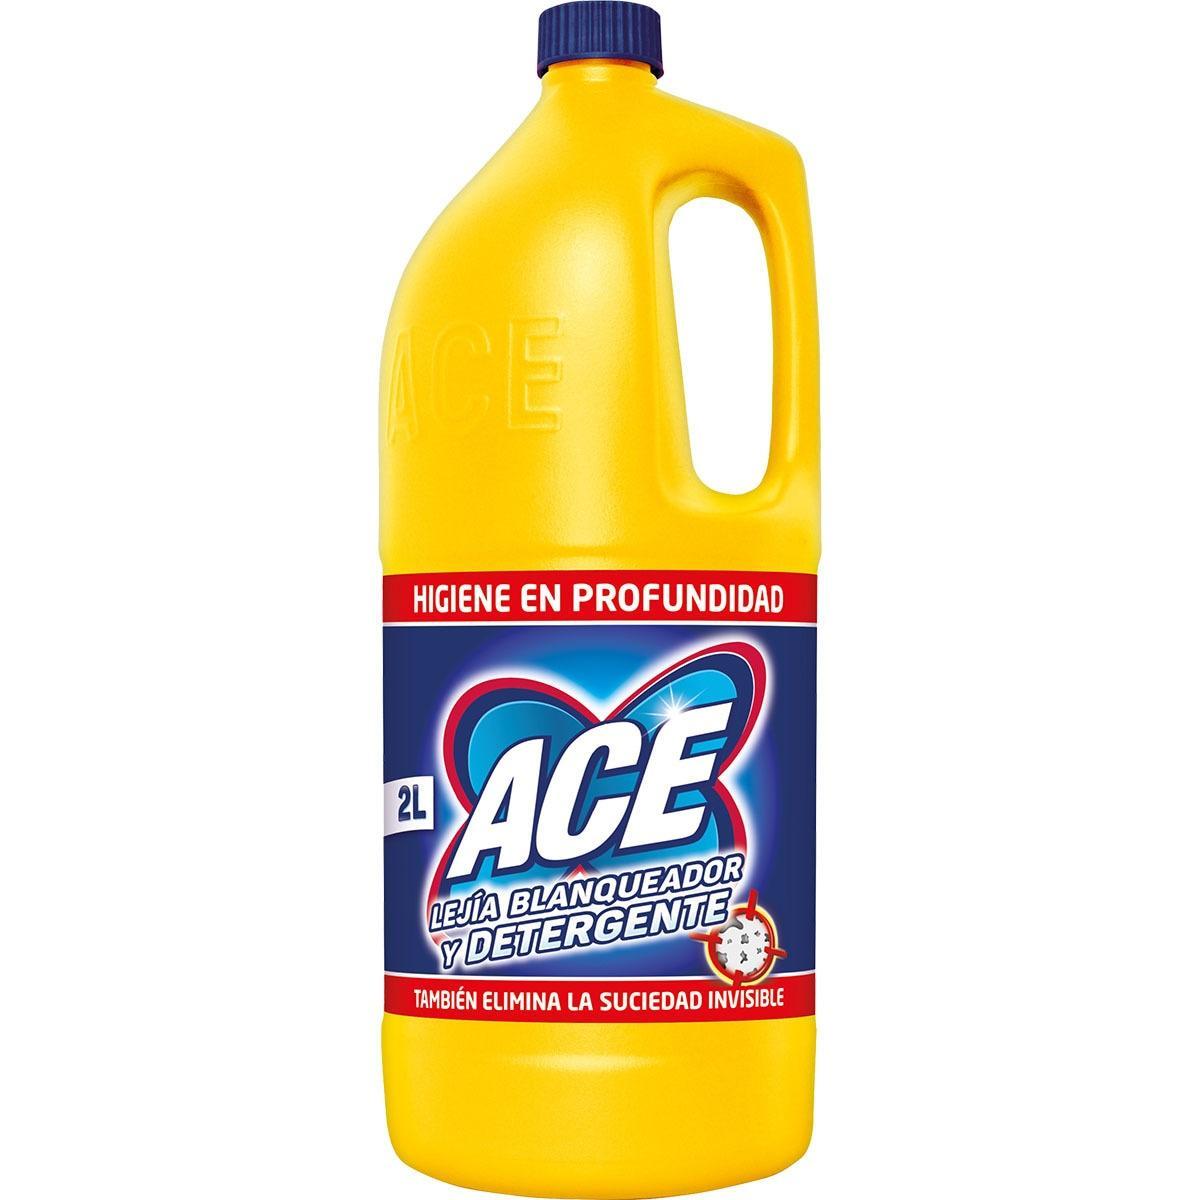 Ace Lejía + Detergente 2L